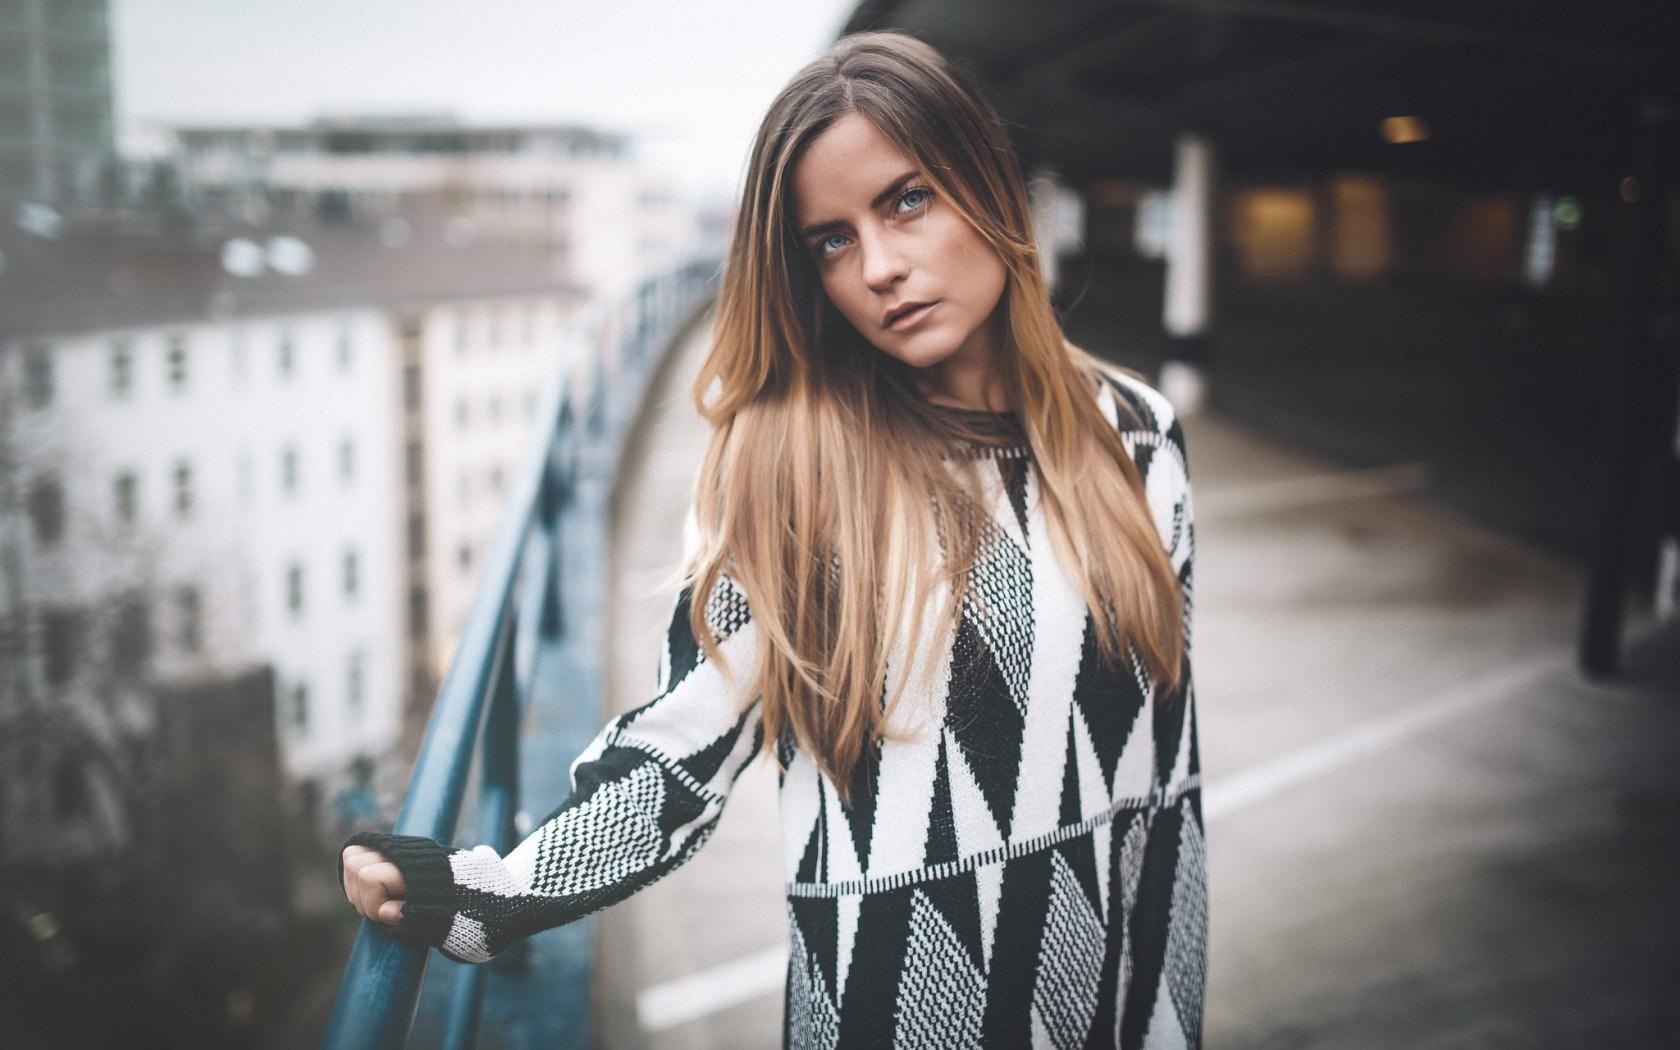 Girl Look Sweater City Mood